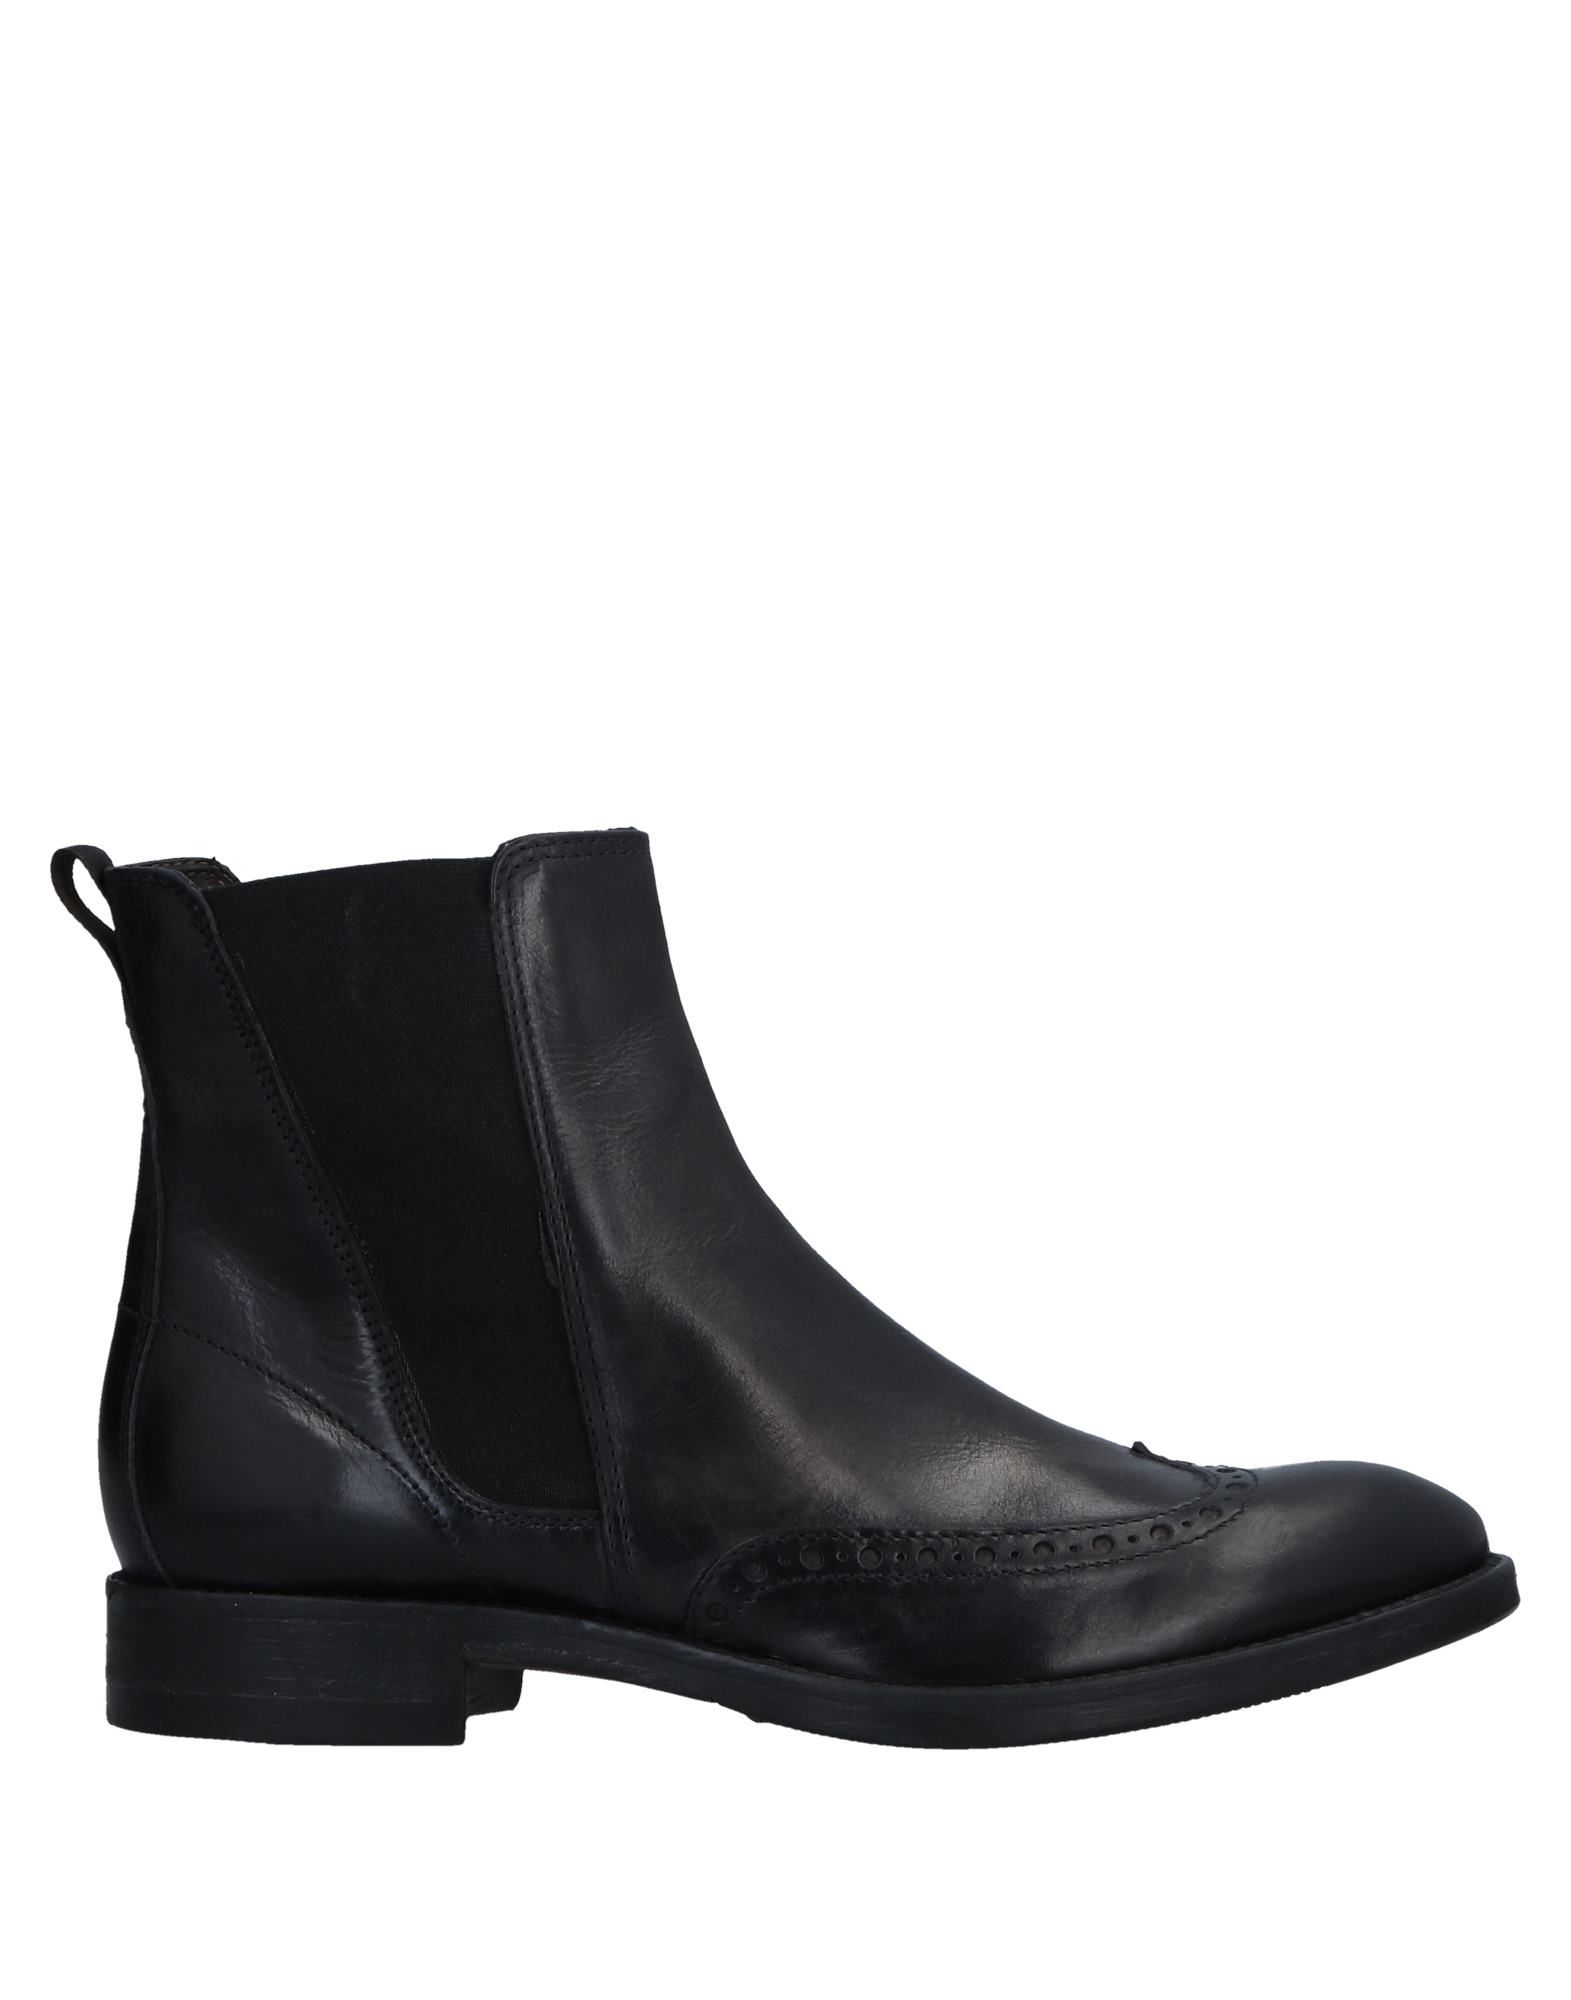 Rabatt echte Schuhe Tremp Stiefelette Herren  11523741FC